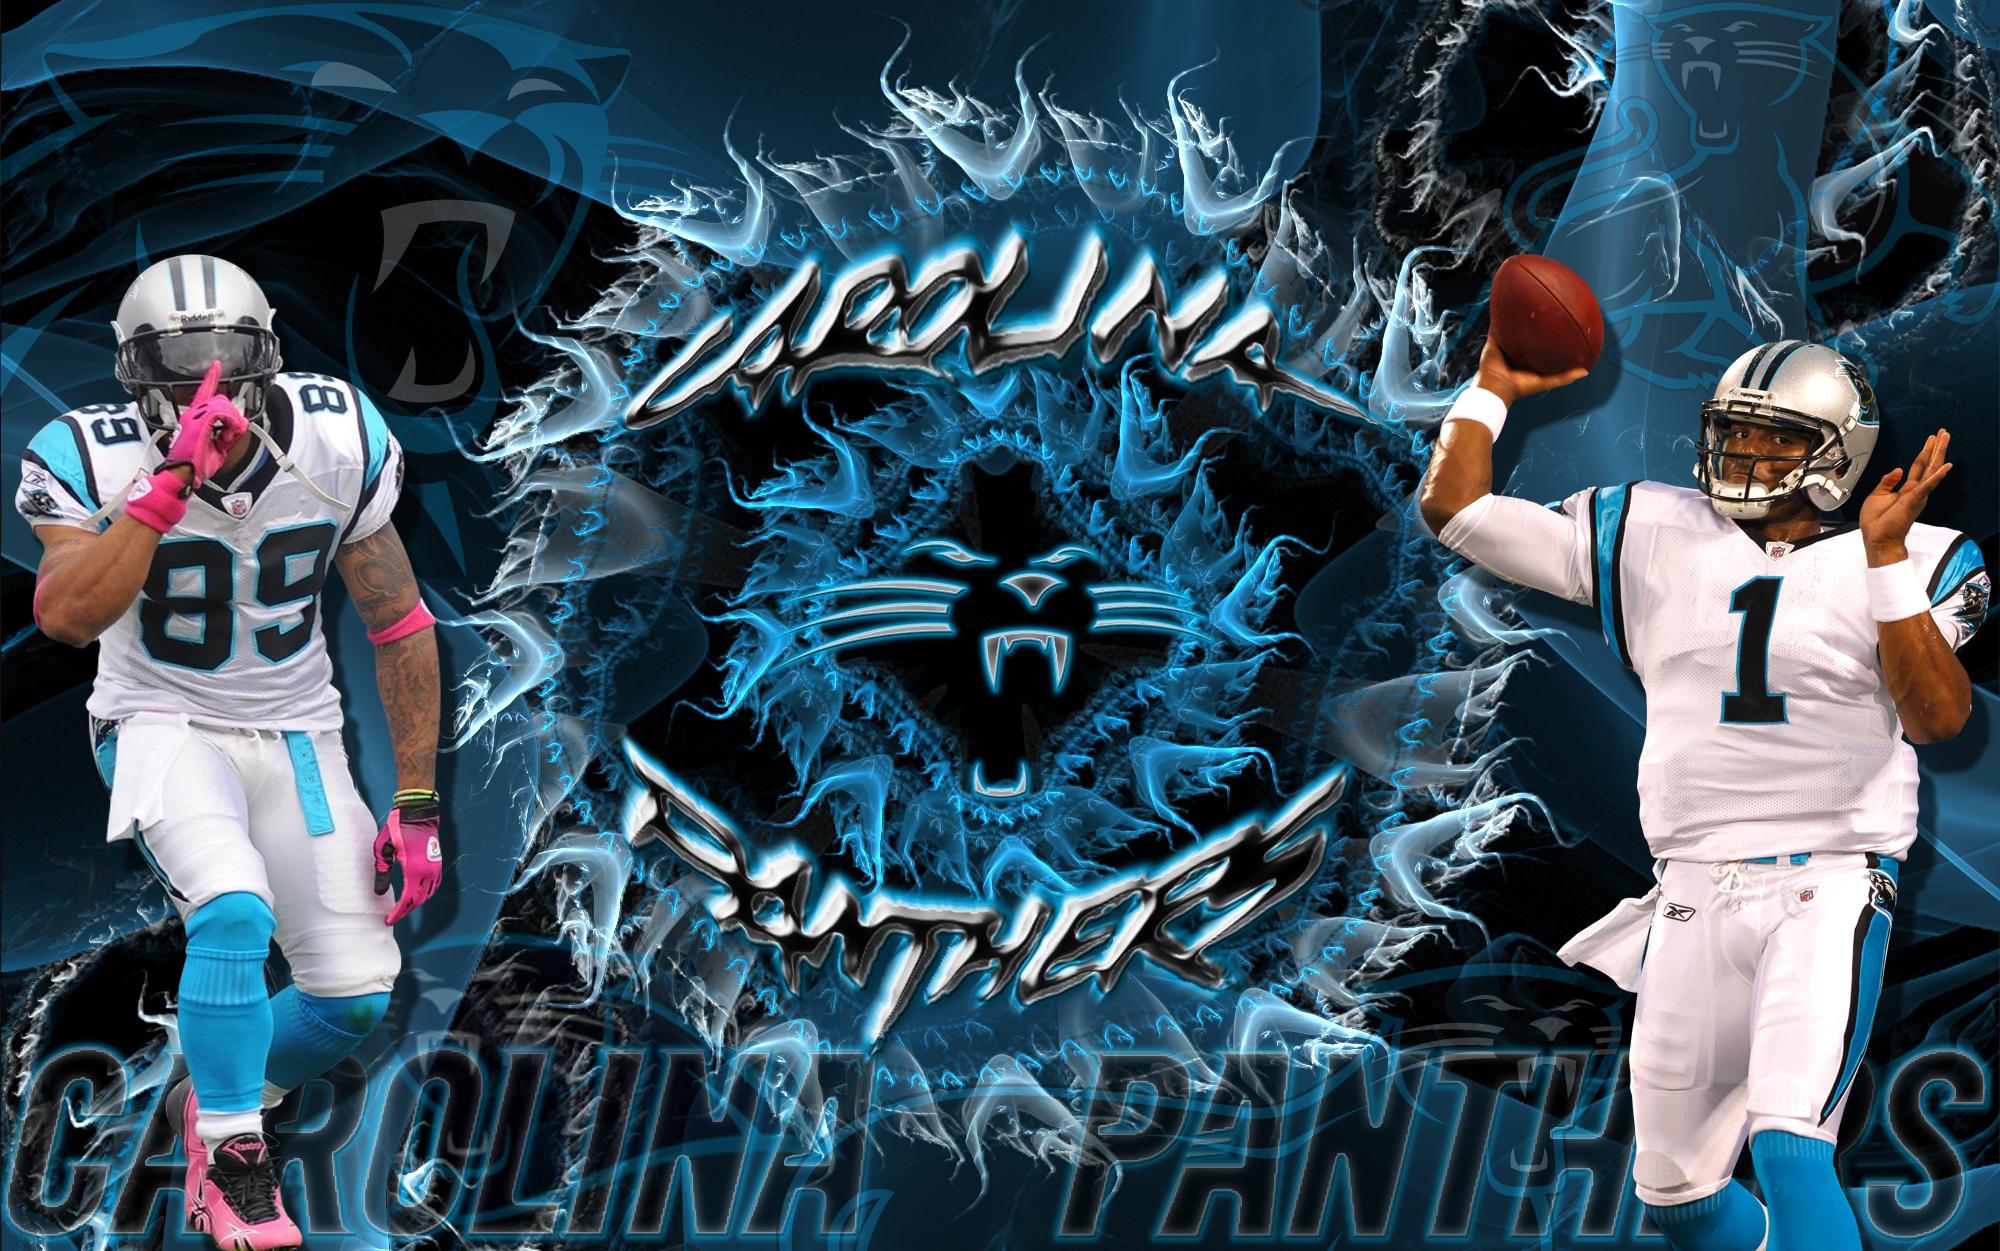 CAROLINA PANTHERS nfl football r wallpaper 2000x1251 157876 2000x1251